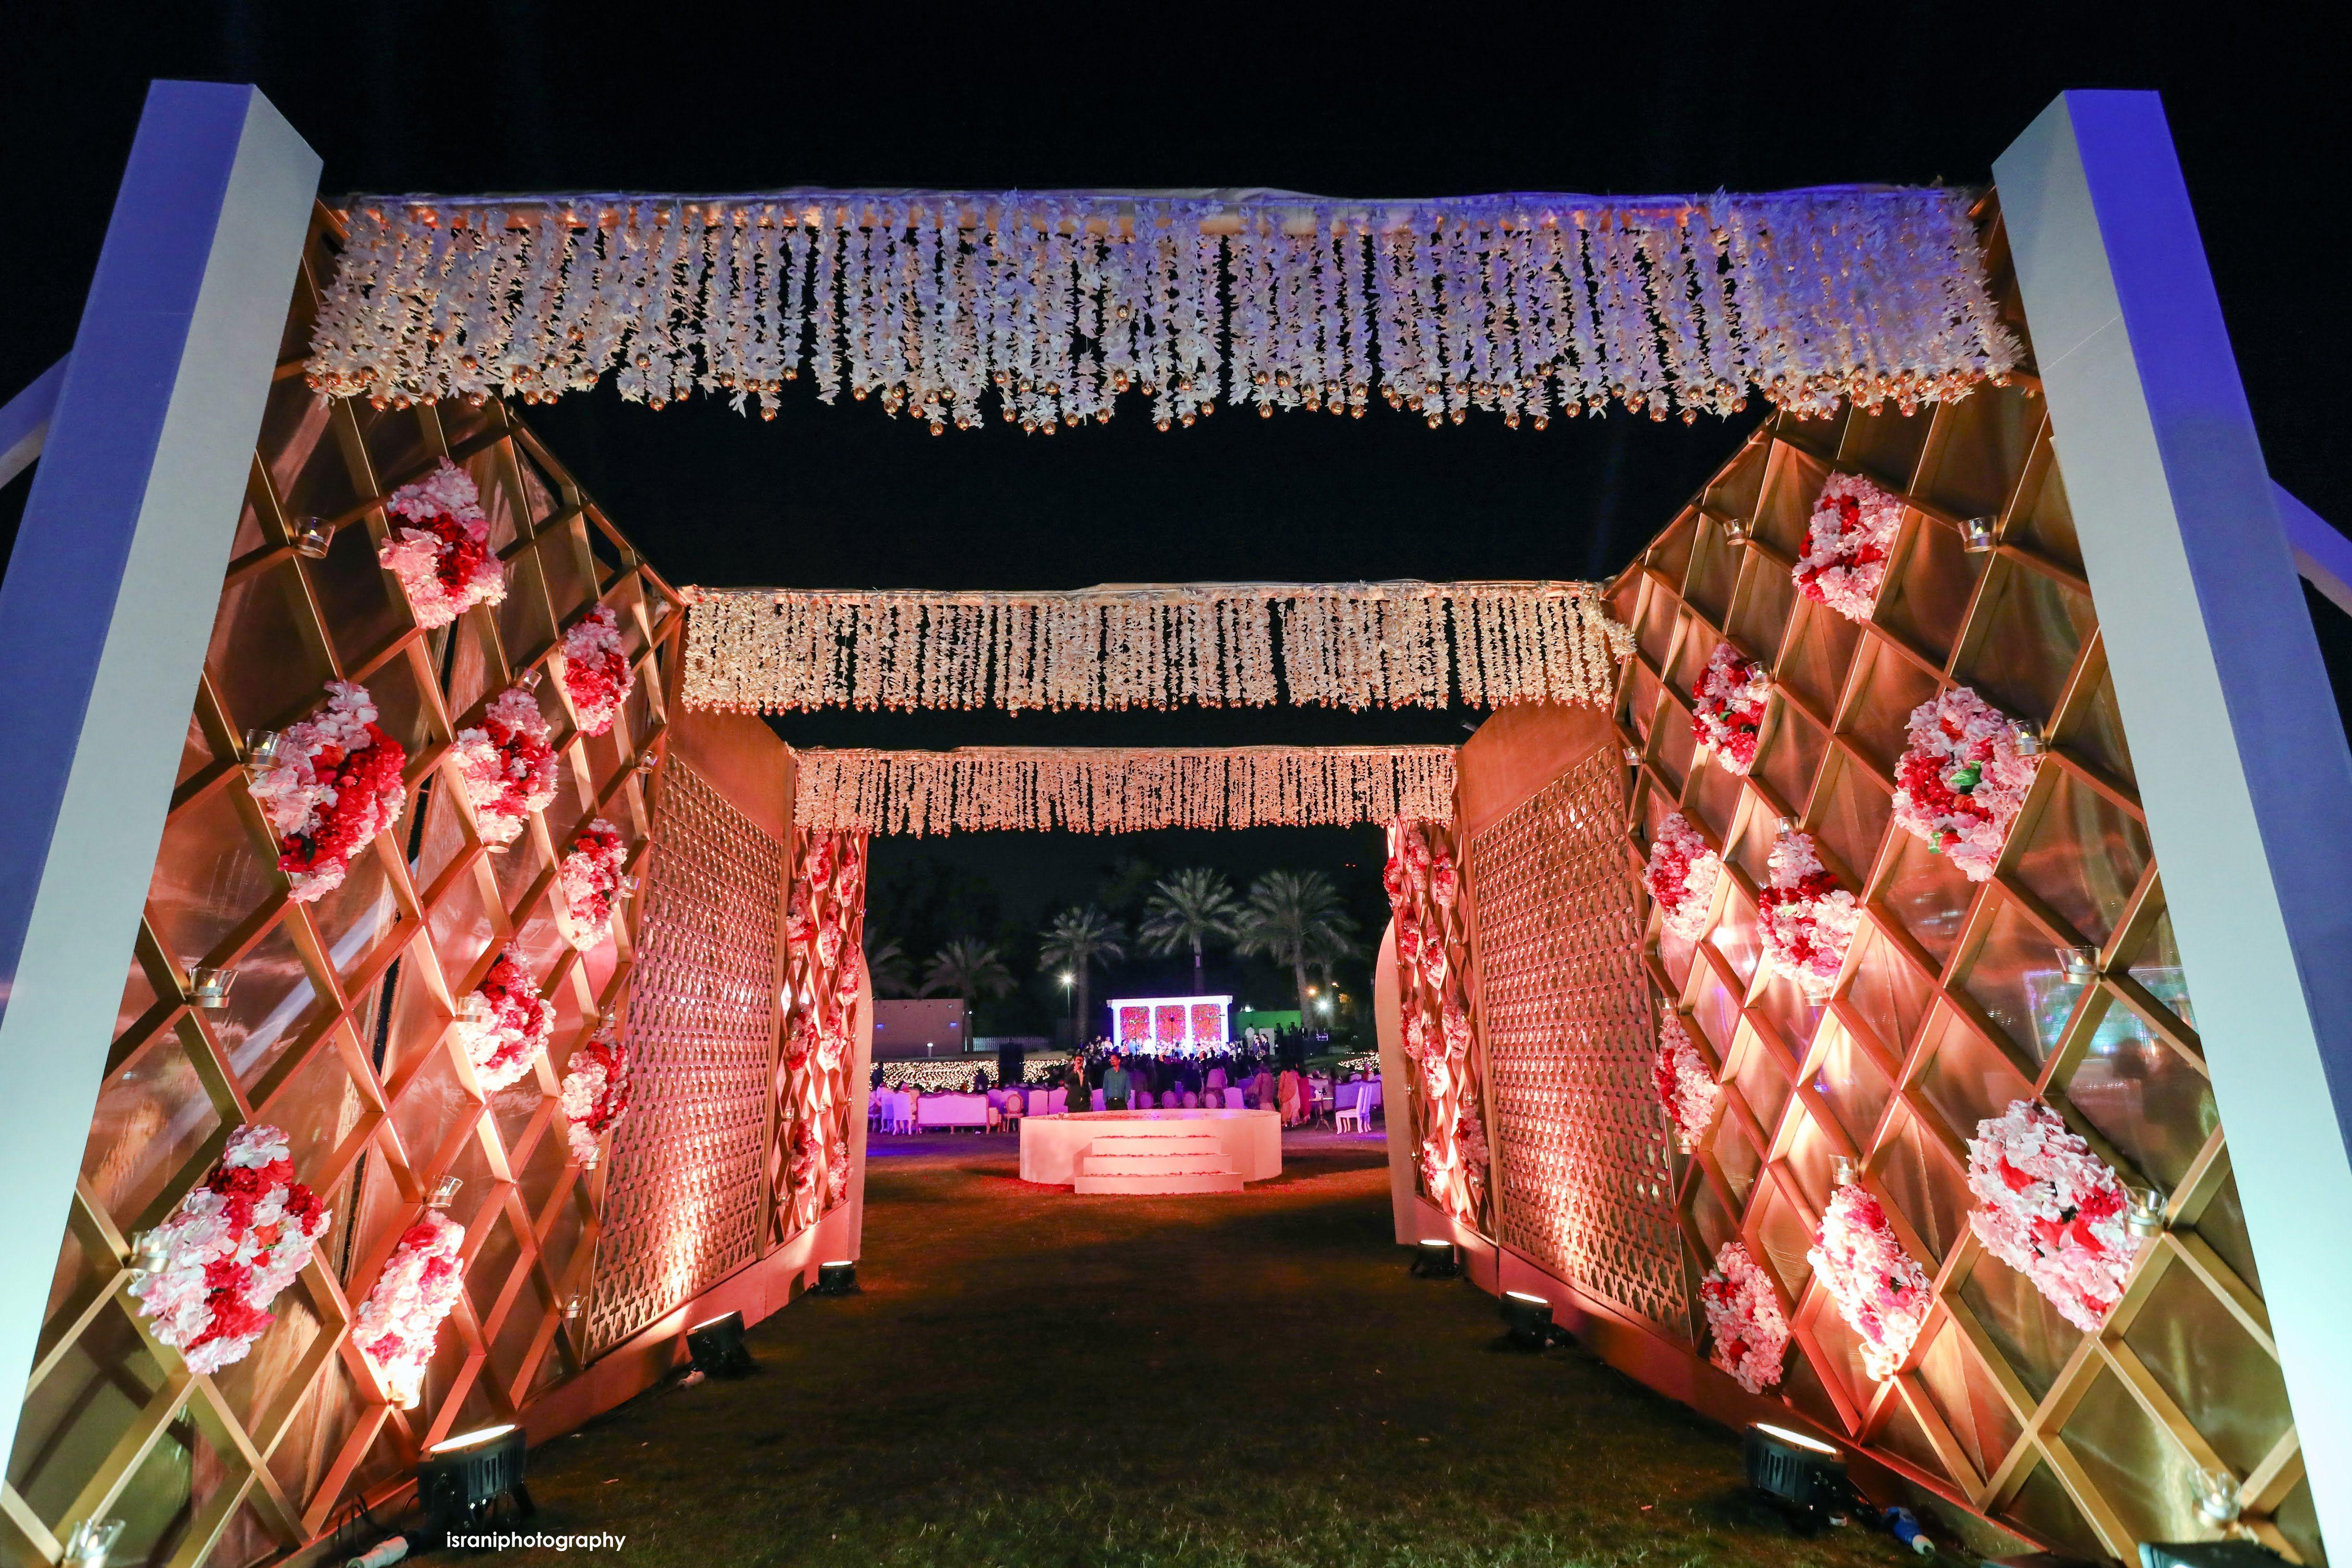 Tamarind Global Weddings is one of the best destination